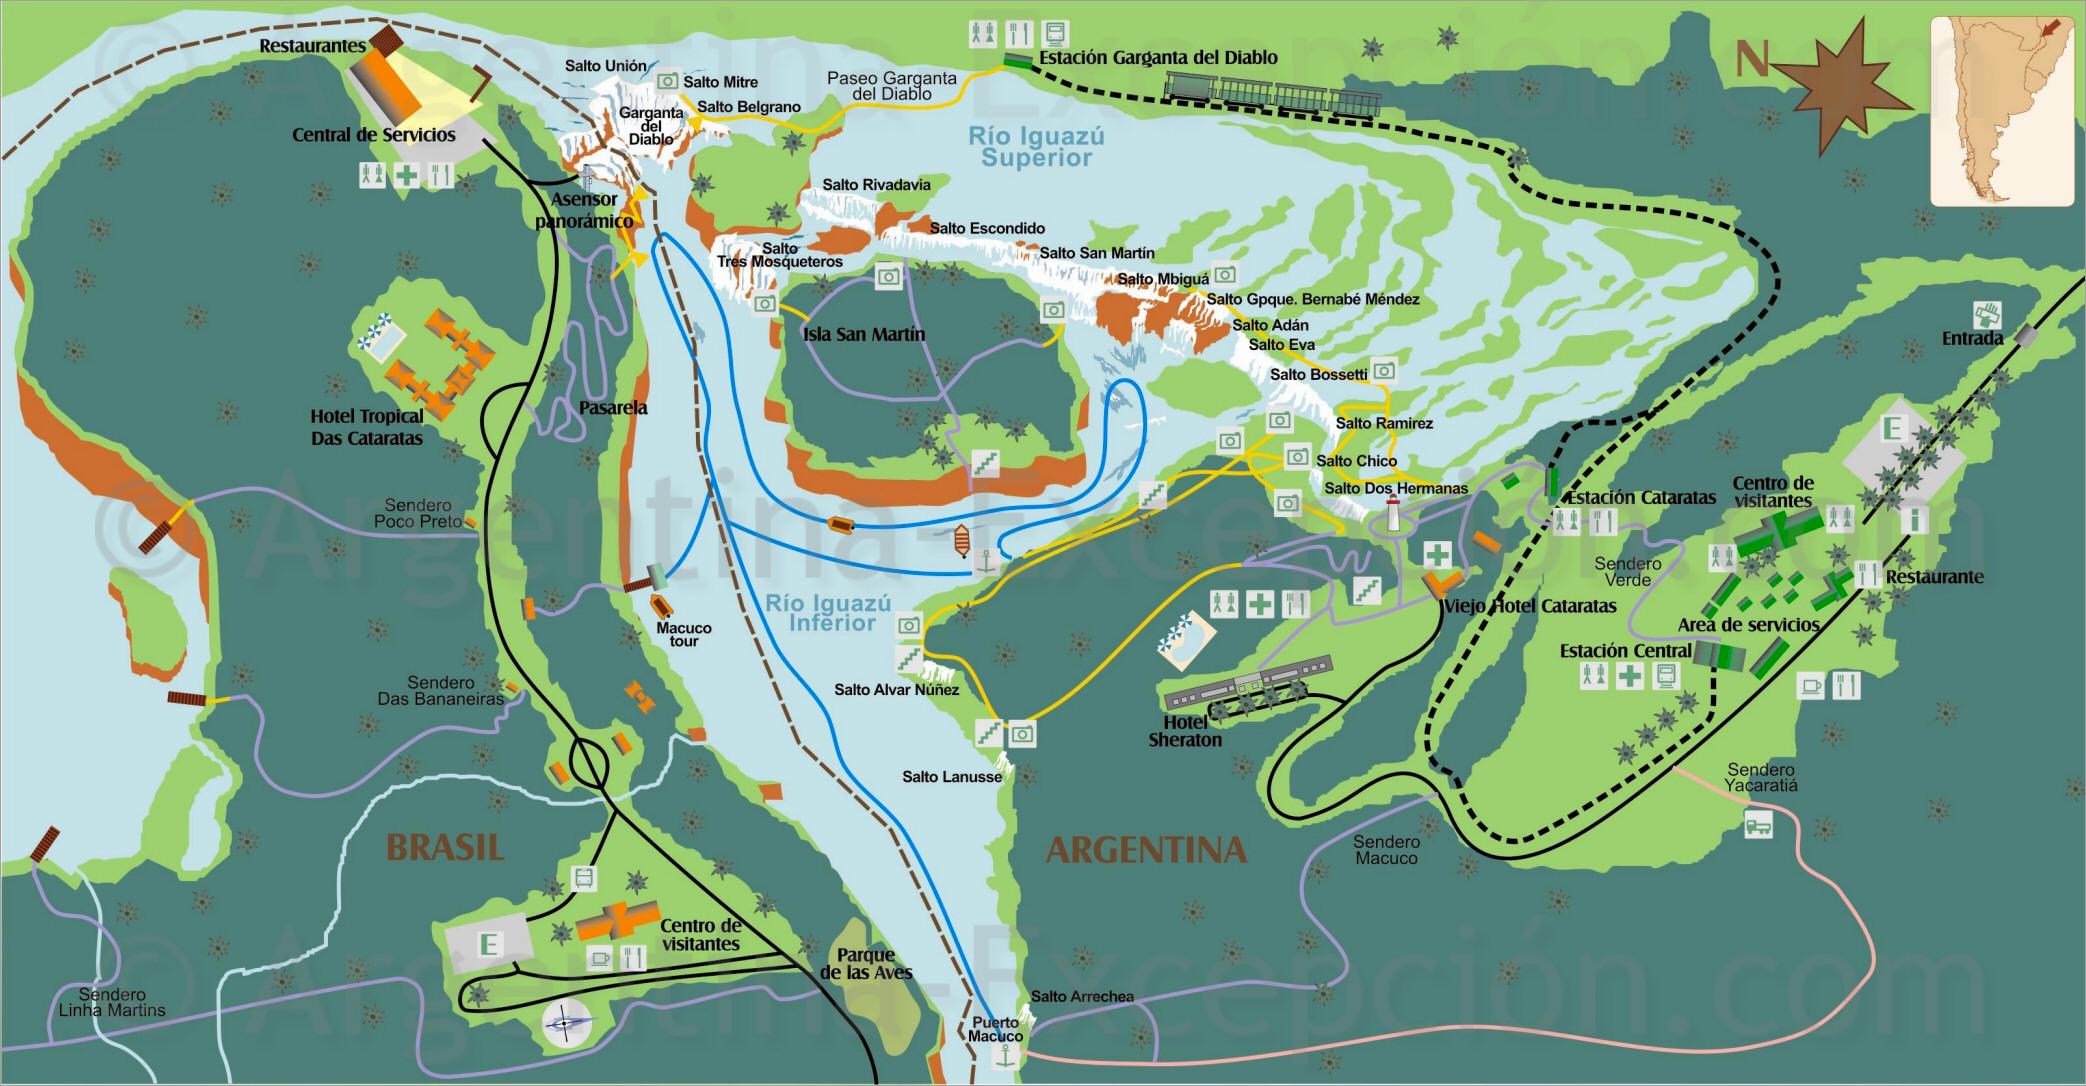 000iguazu-national-park-mapjpg